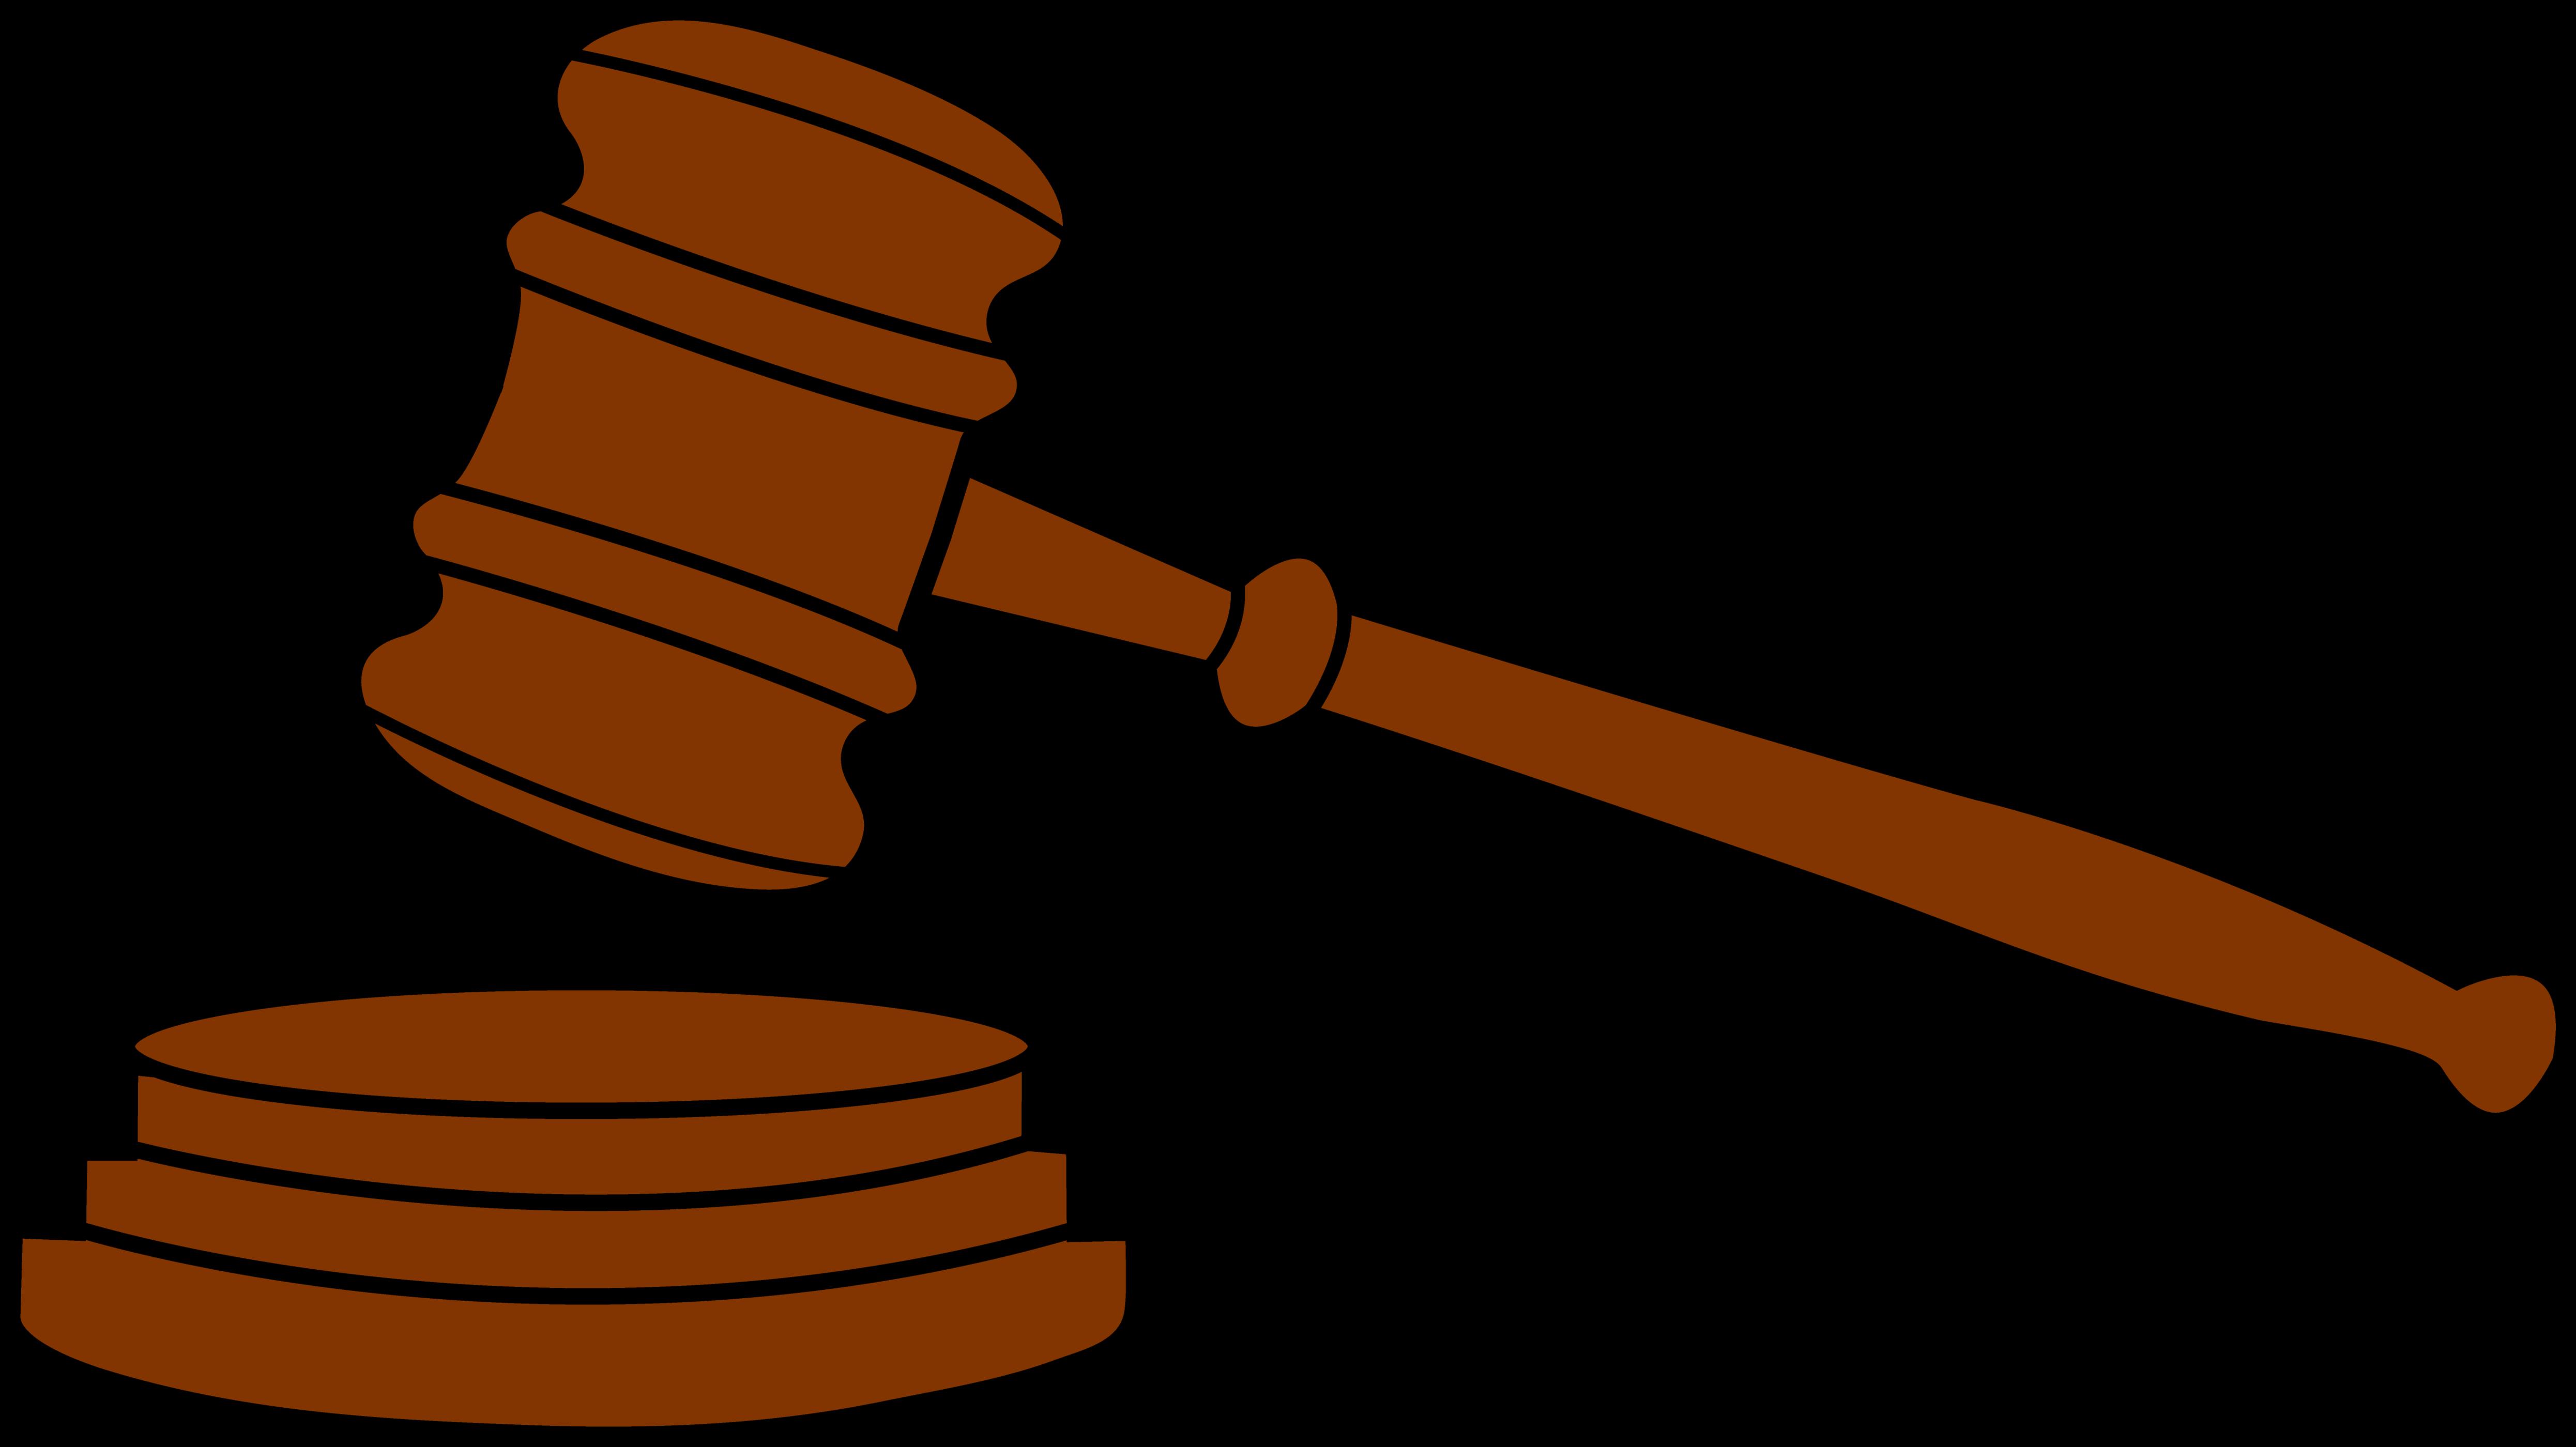 lawyer symbol clipart best